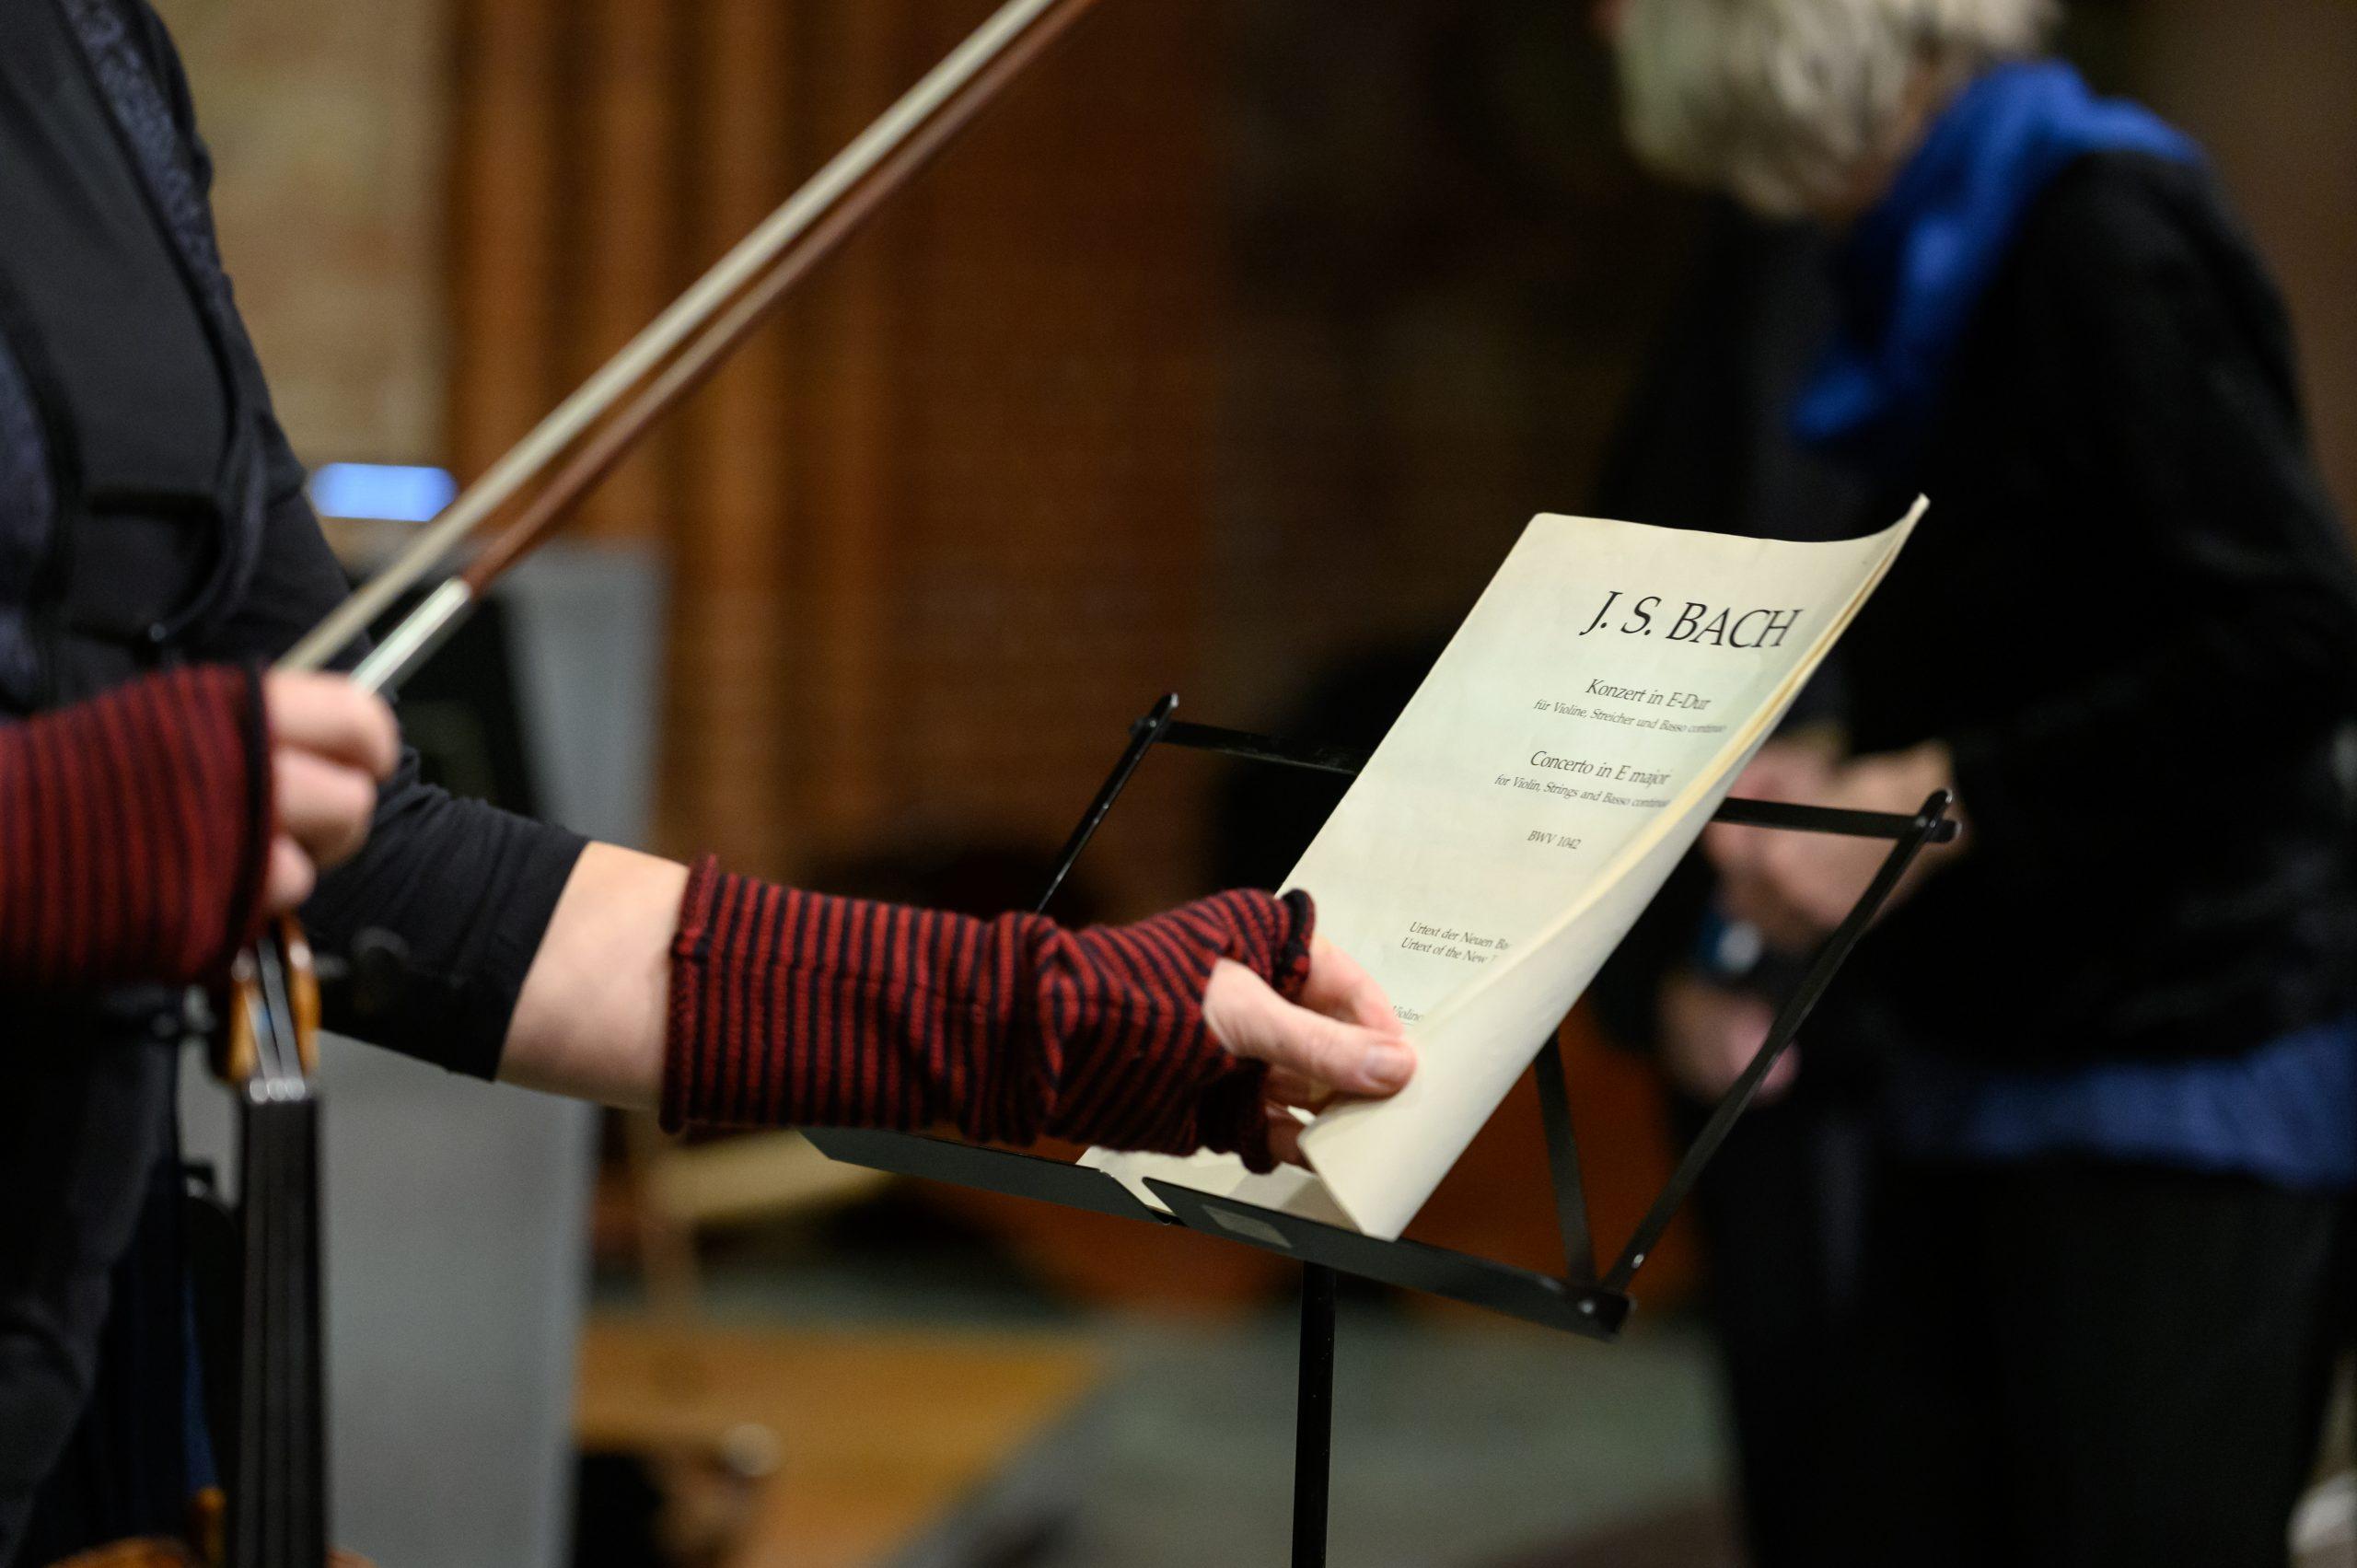 Bach, Violinkonzert E-Dur